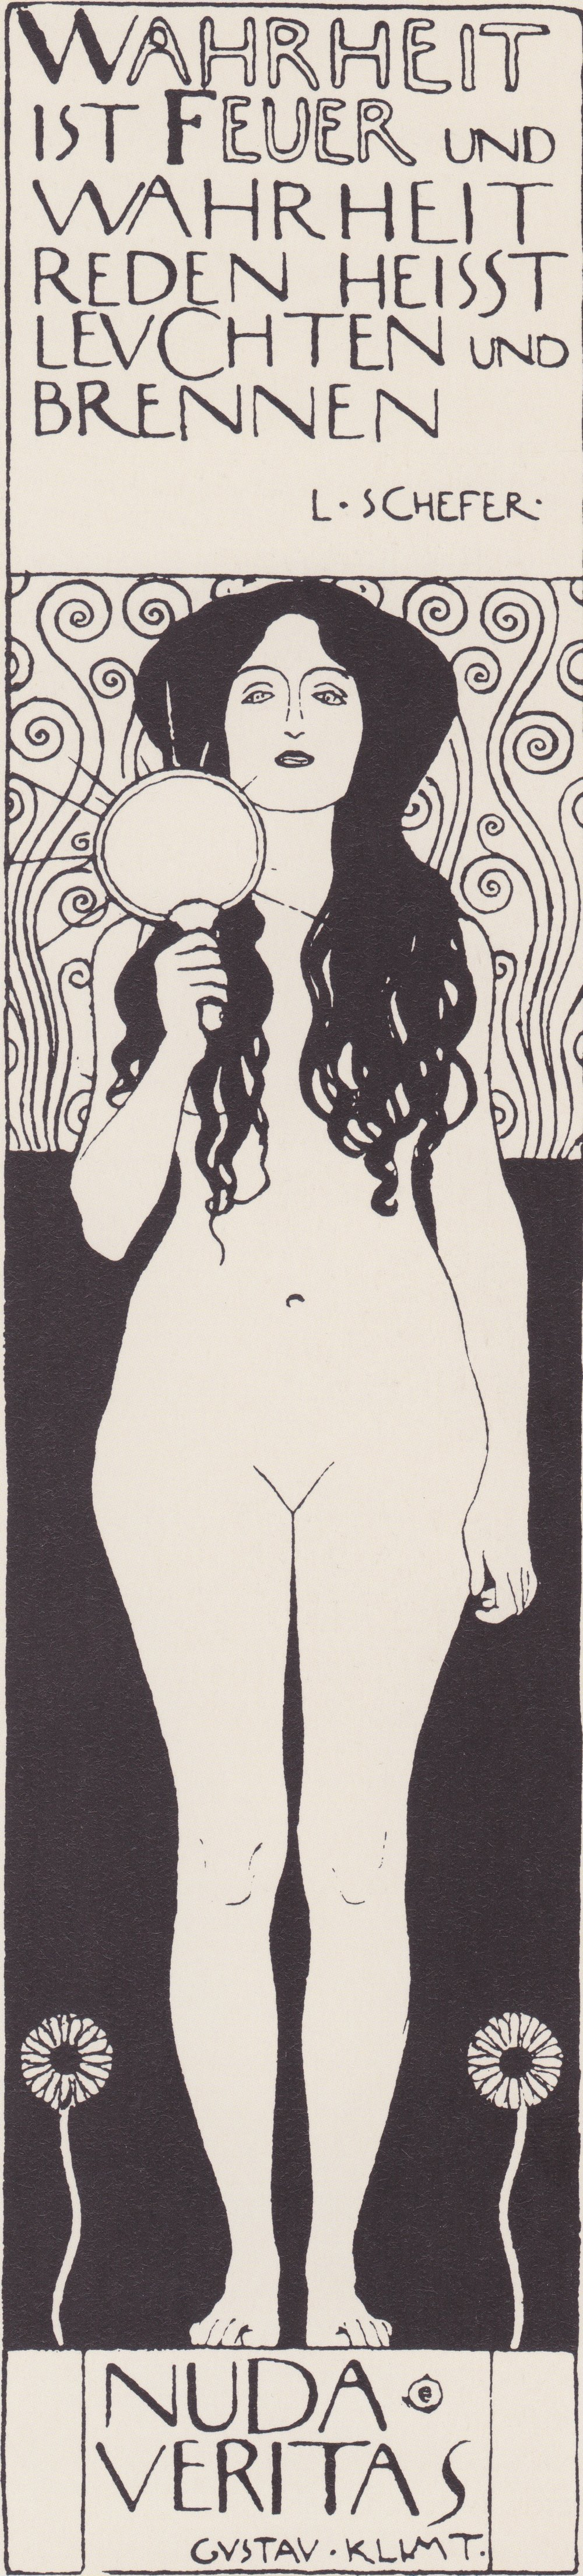 "Gustav Klimt, ""Nuda Veritas"" (1898)"